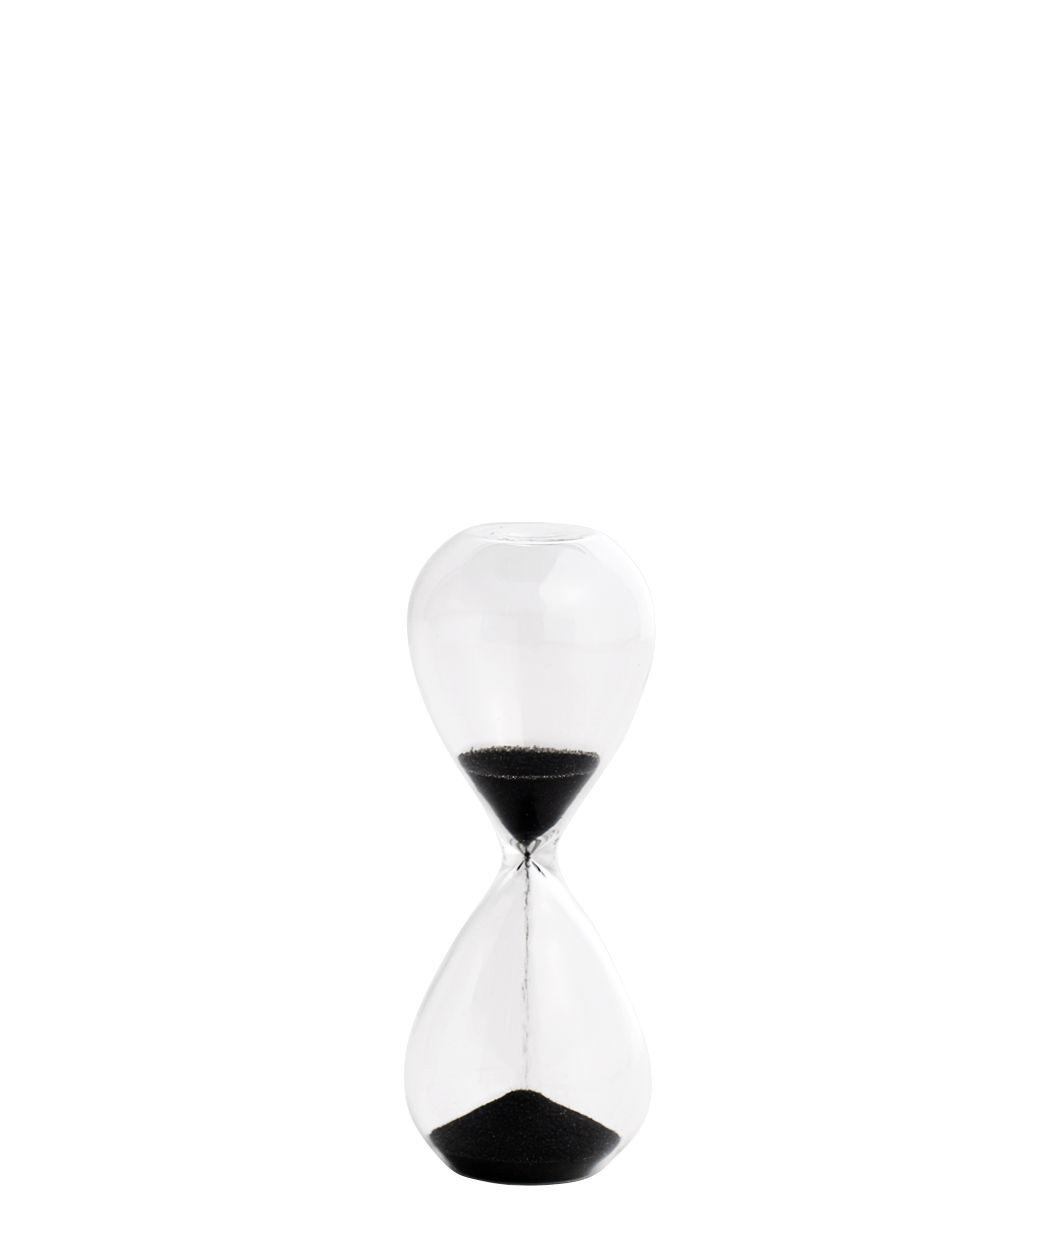 Cucina - Utensili da cucina - Clessidra Time Small - / 3 Minuti - H 9 cm di Hay - Trasparente / nero - sabbia, Vetro